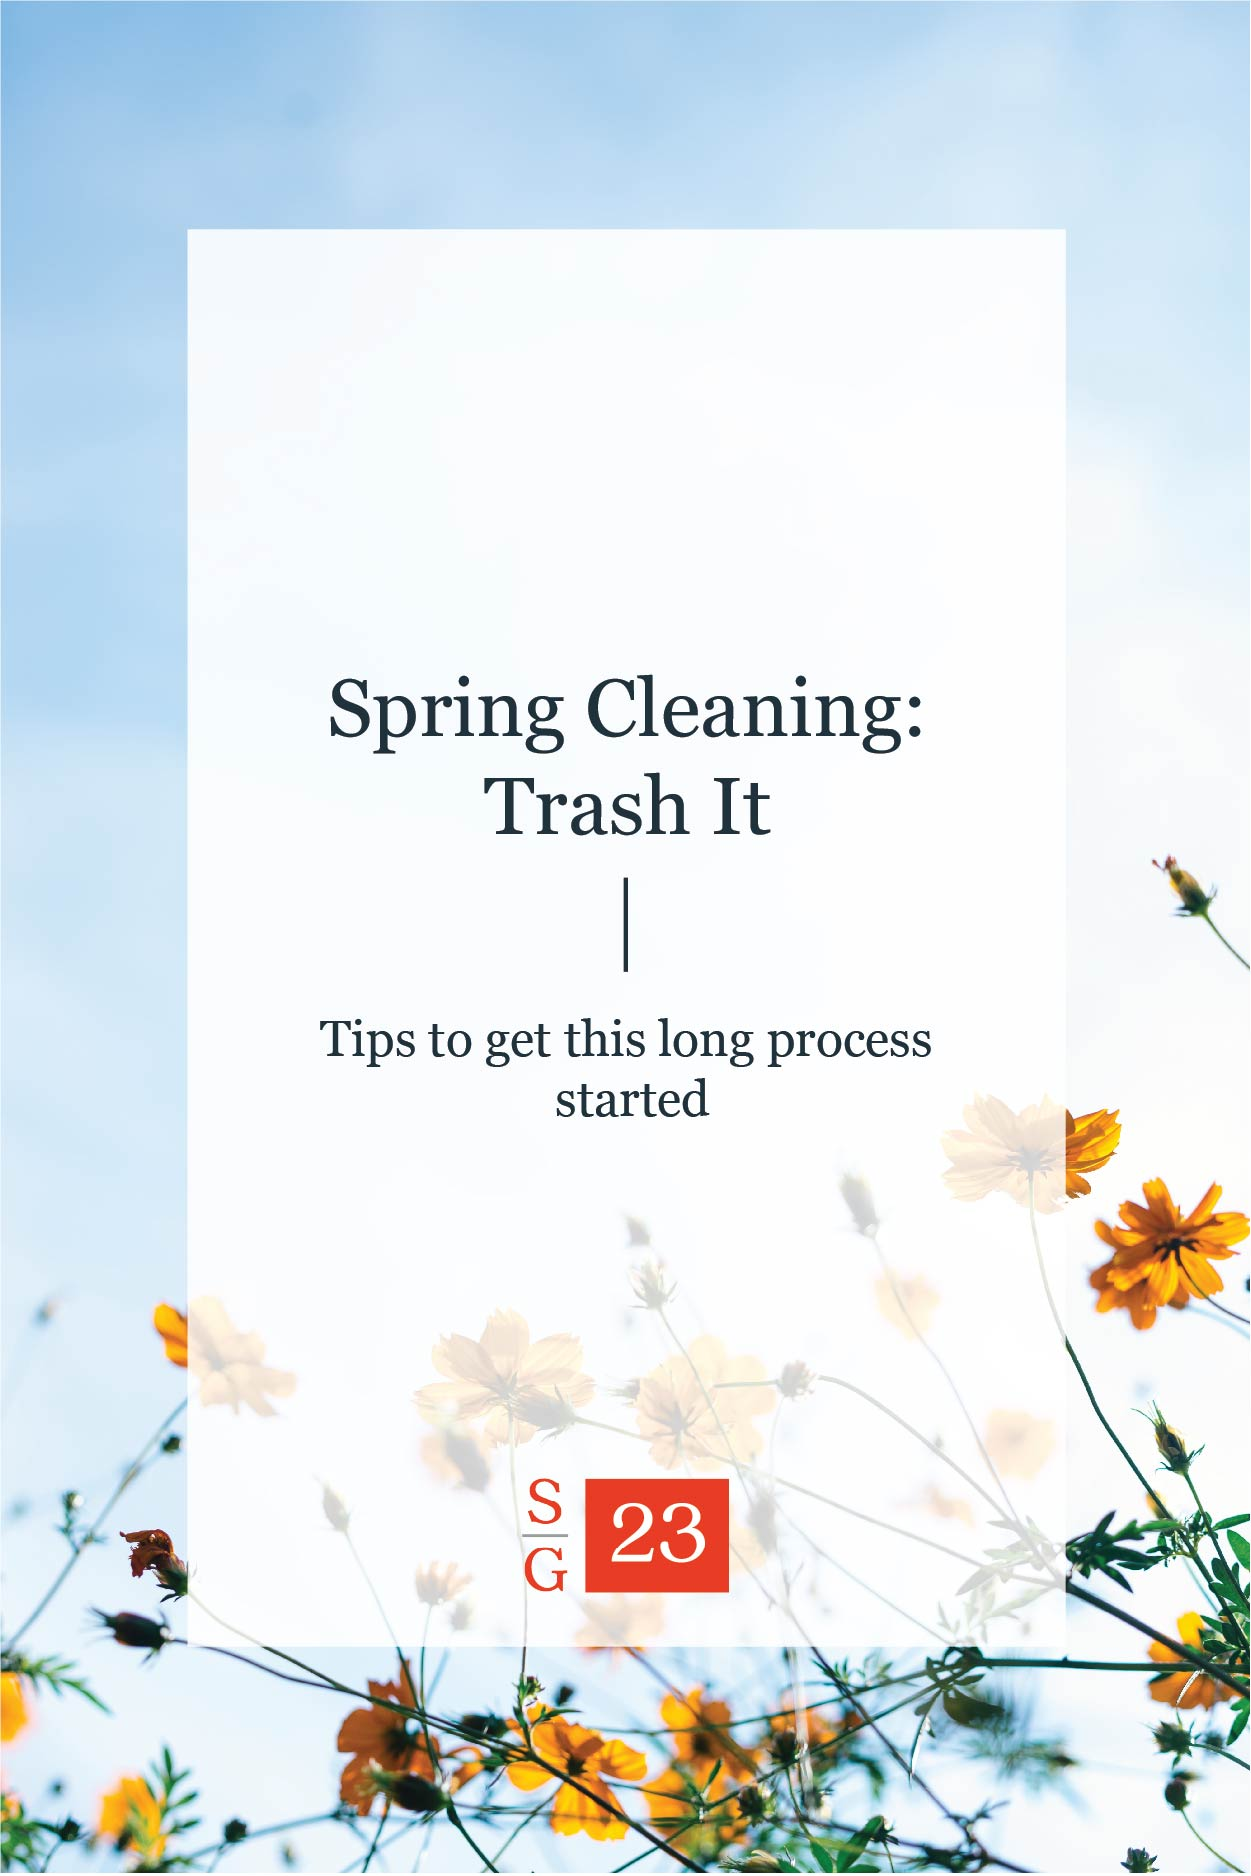 spring-cleaning-trash-01.jpg